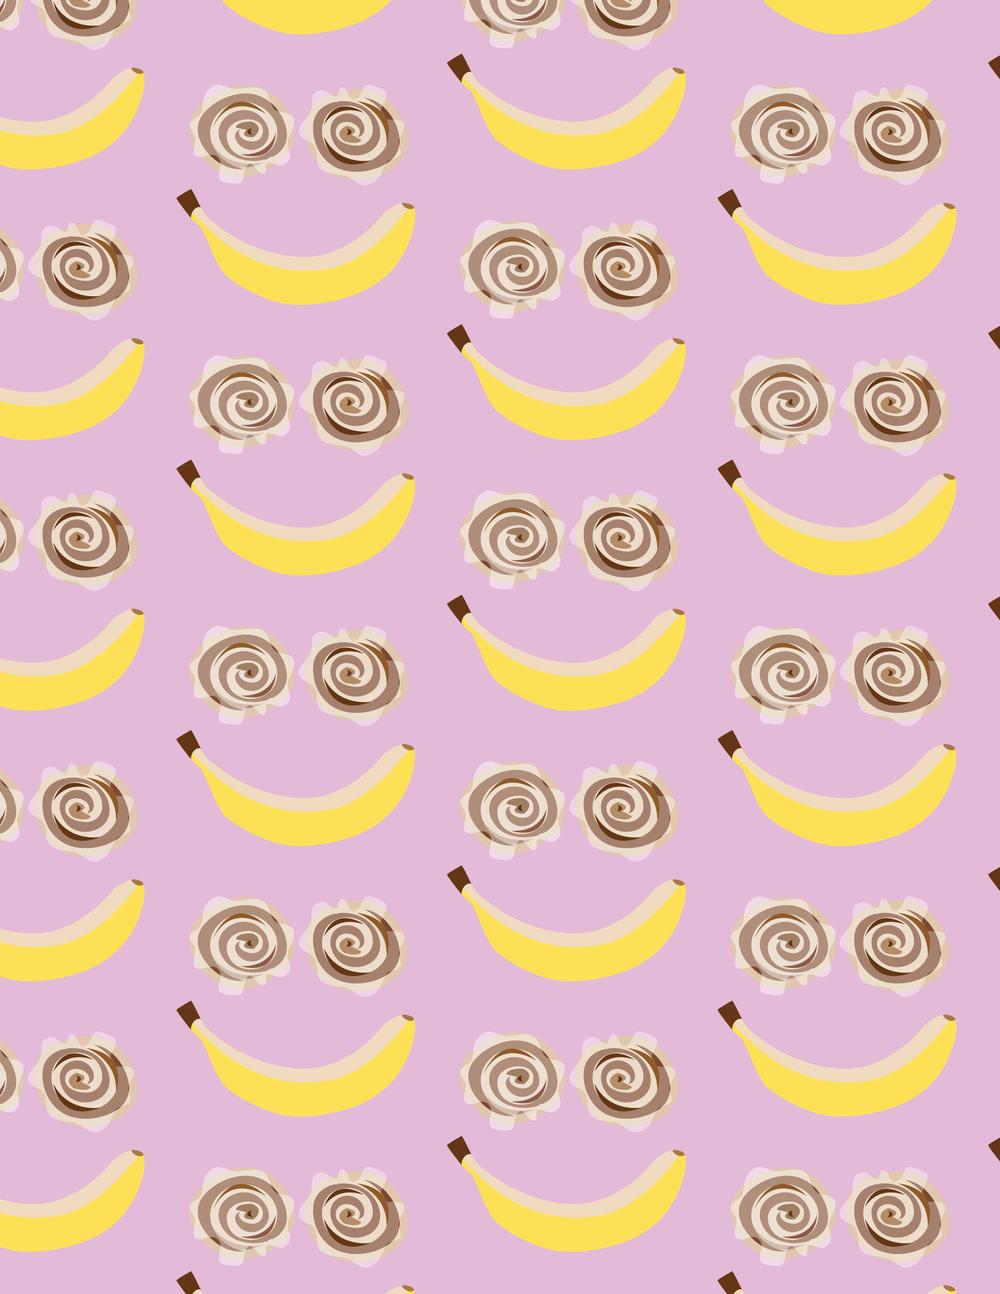 breakfast_patterns-02.png